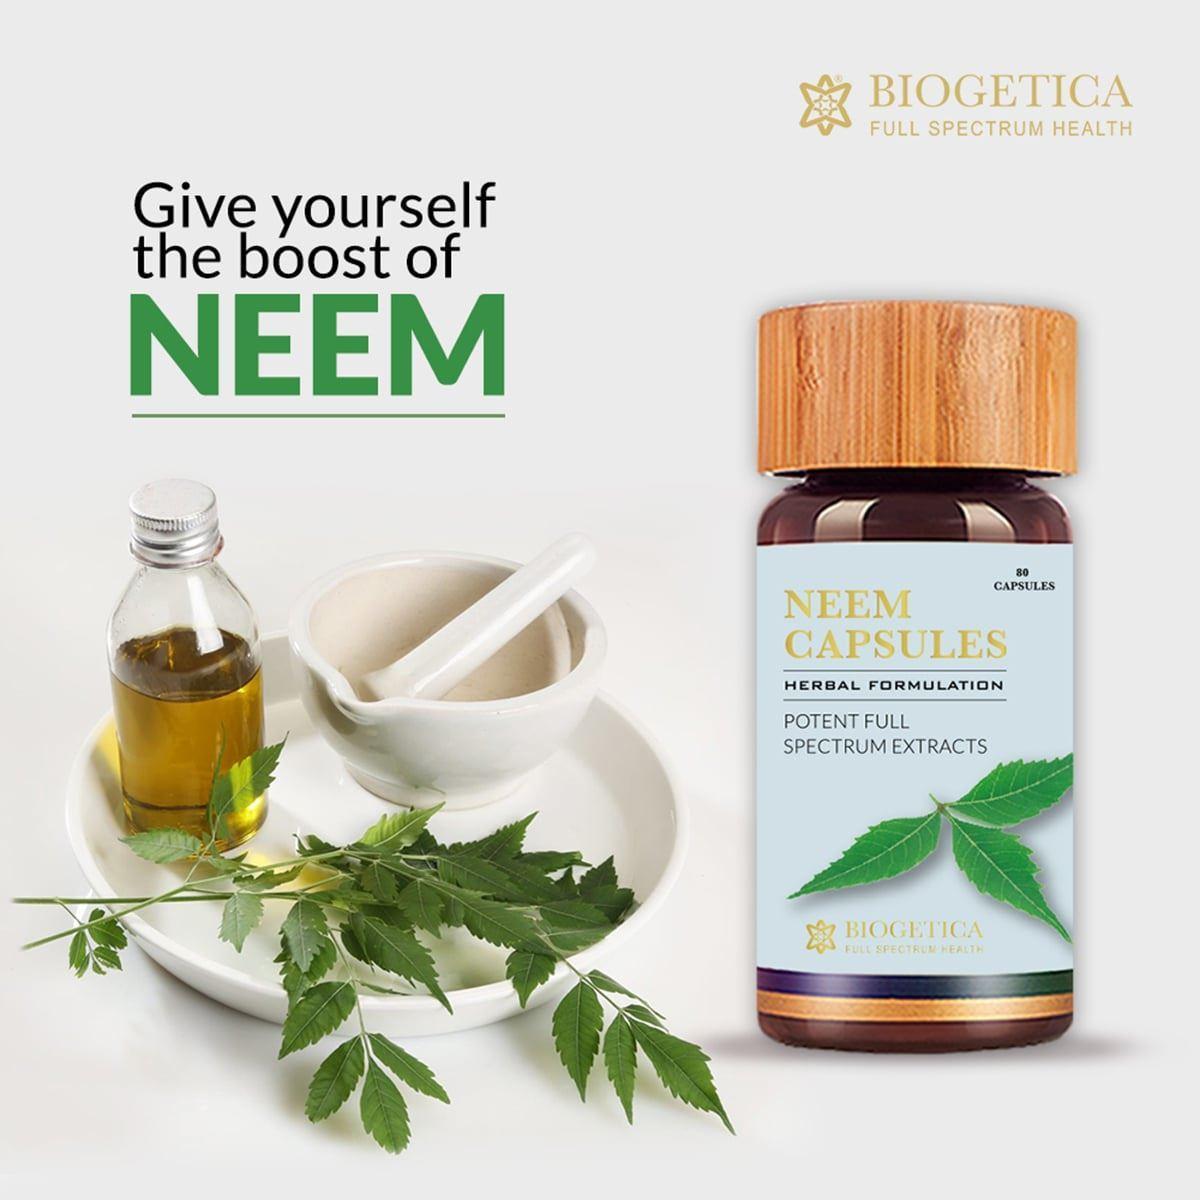 Picture of Biogetica's Blood Purifying Anti-inflammatory Detox Neem Capsules (80 Capsules)